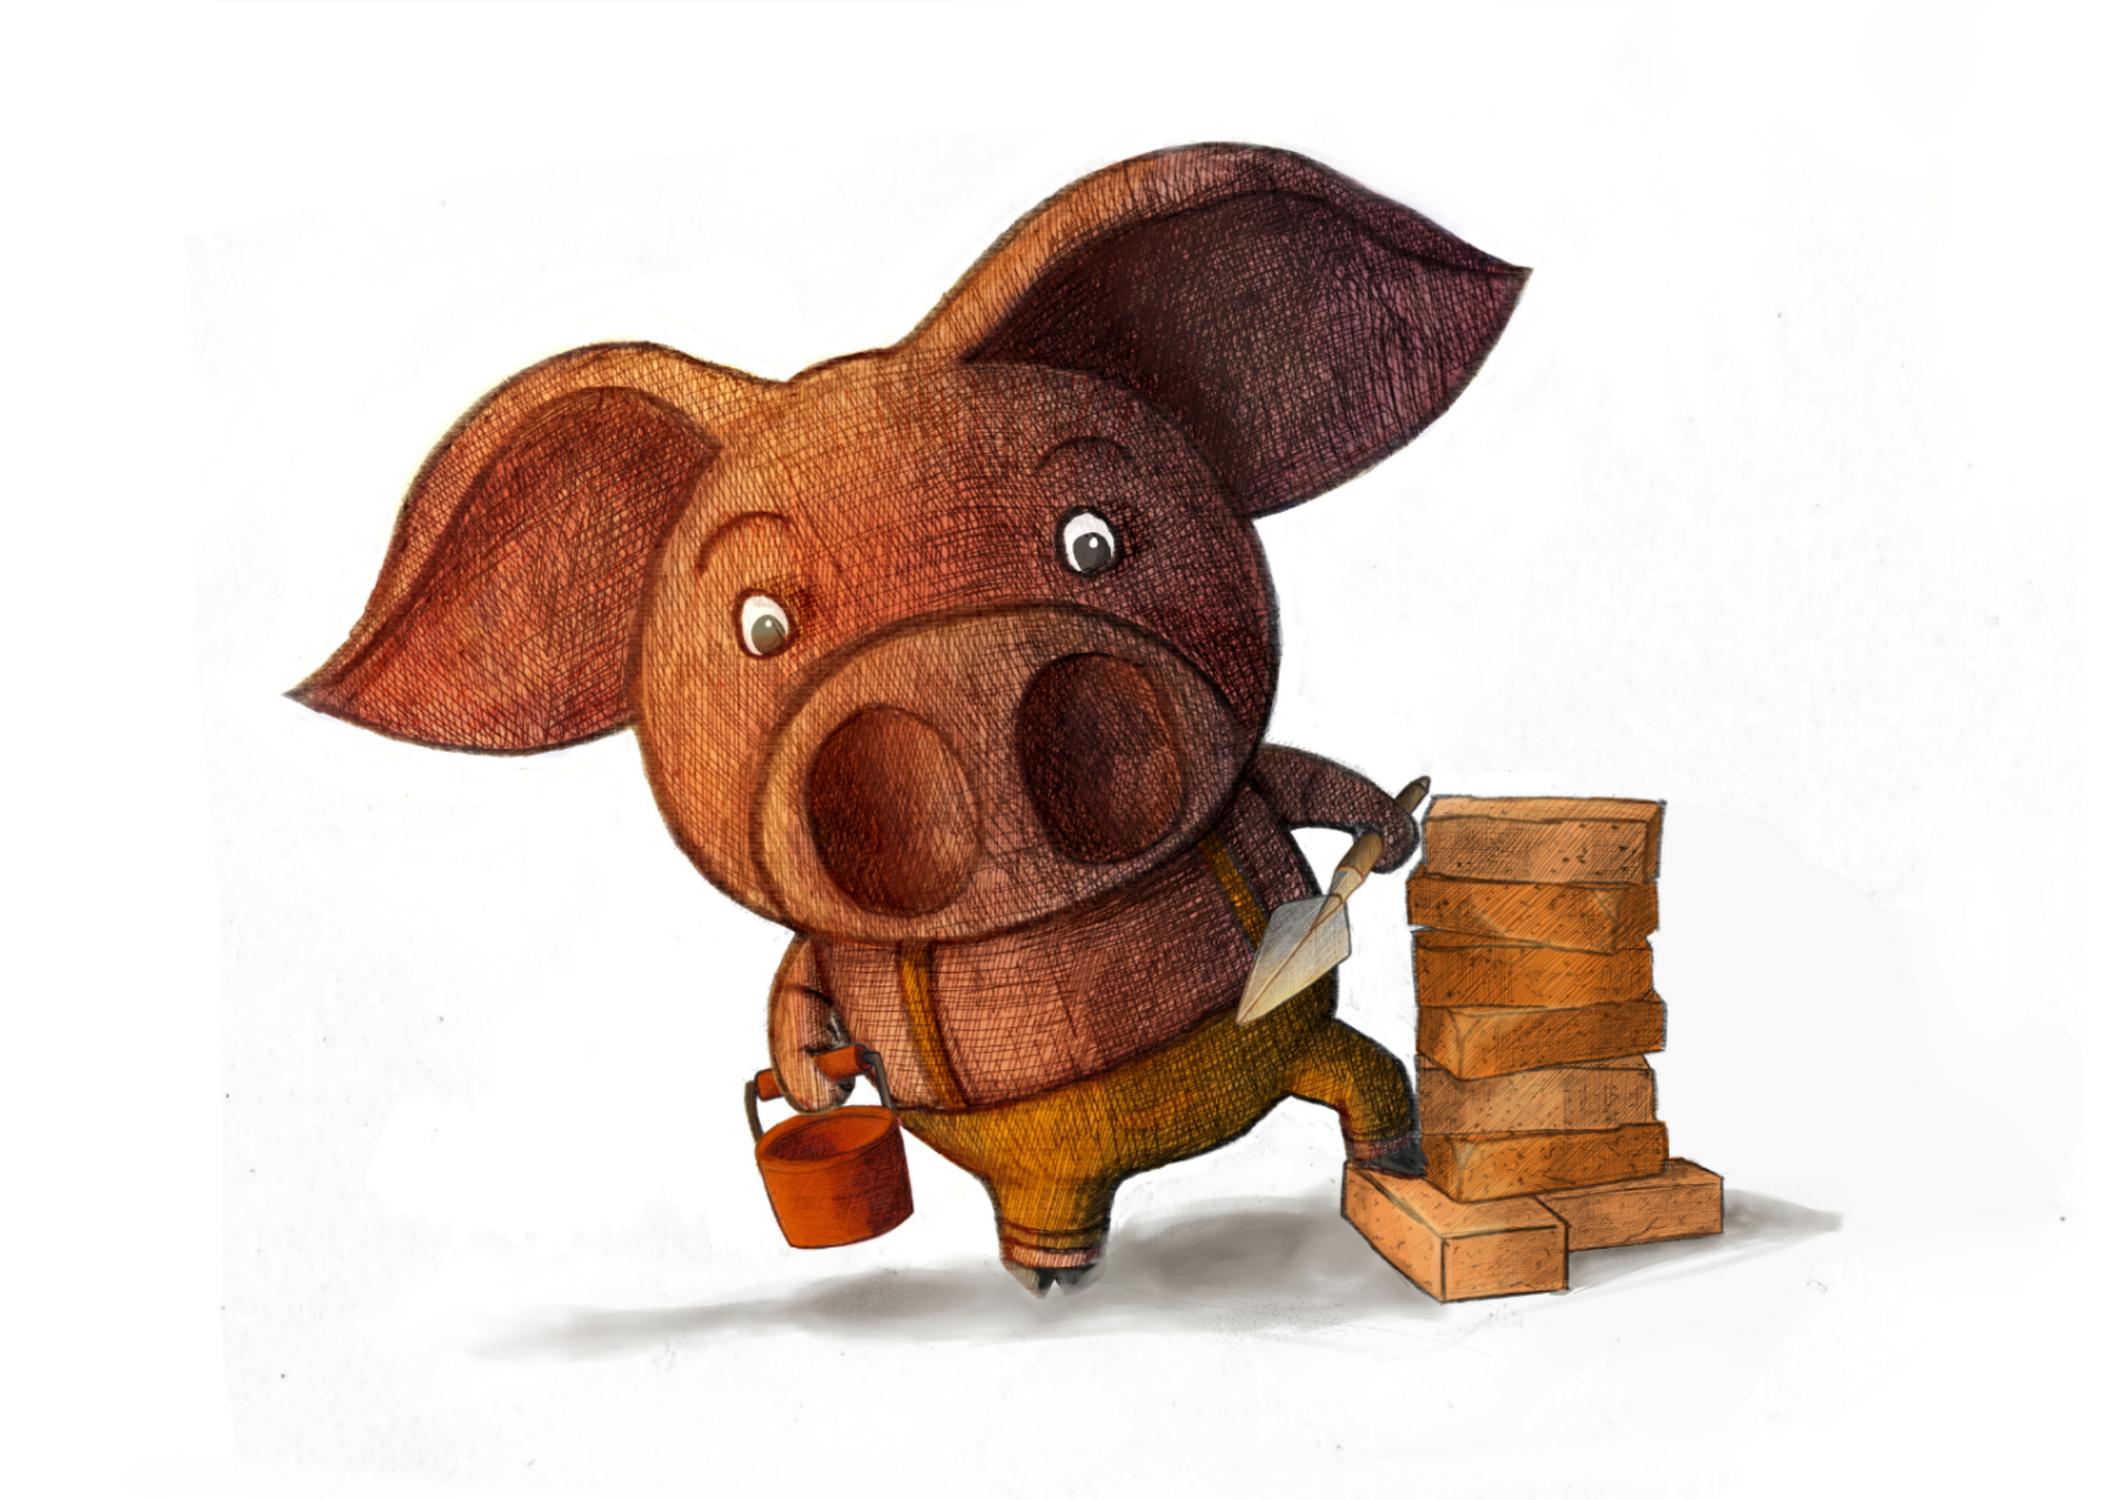 Pig of Bricks Artwork by Julian Beresford